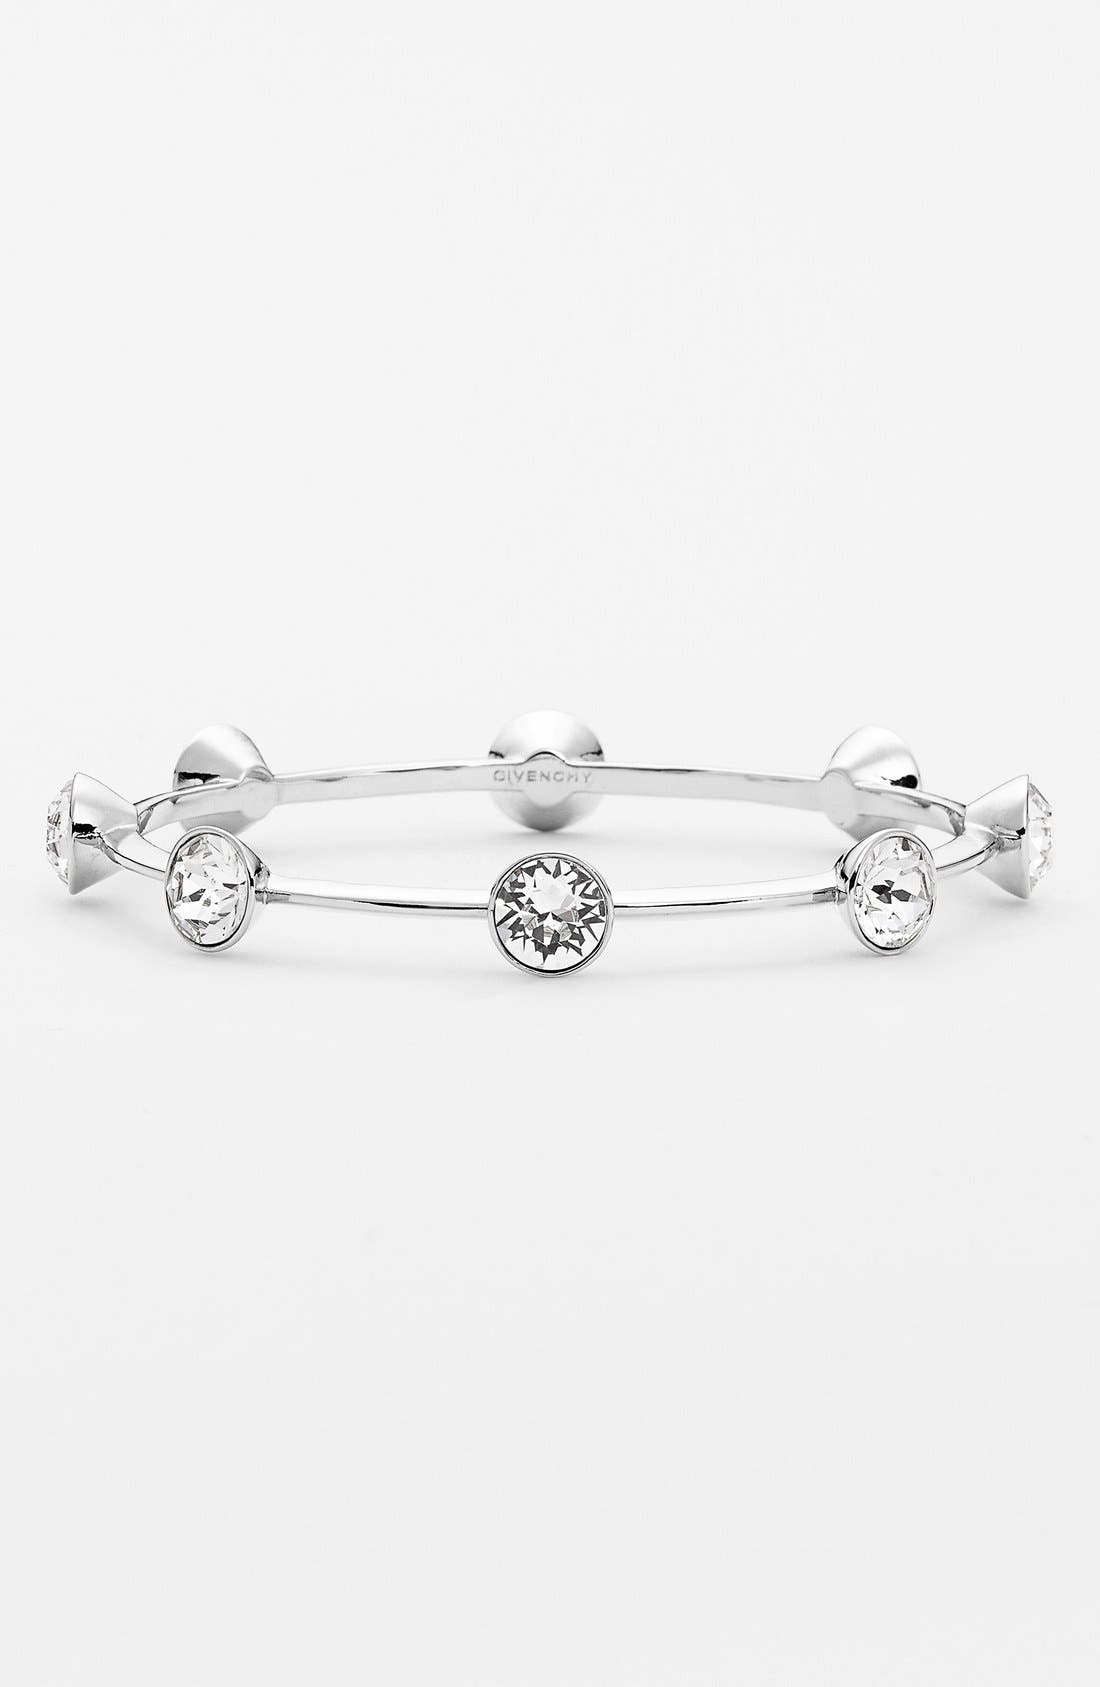 Alternate Image 1 Selected - Givenchy Crystal Skinny Bangle